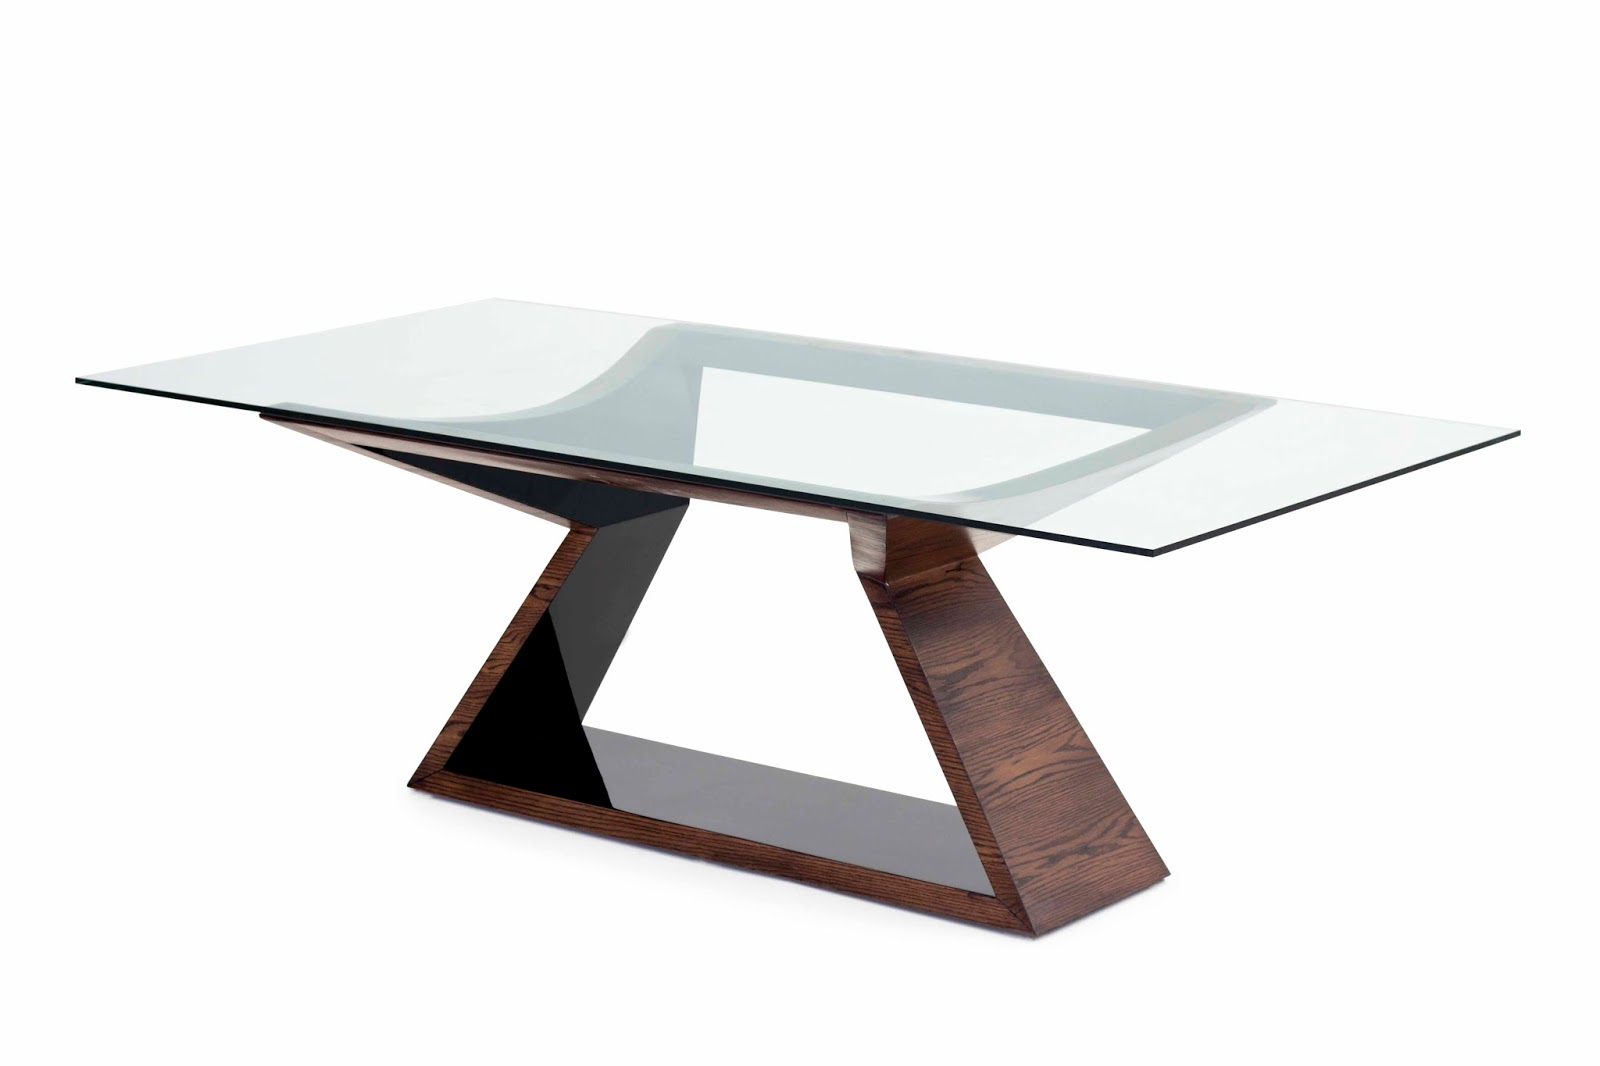 mil nio home base de mesa. Black Bedroom Furniture Sets. Home Design Ideas